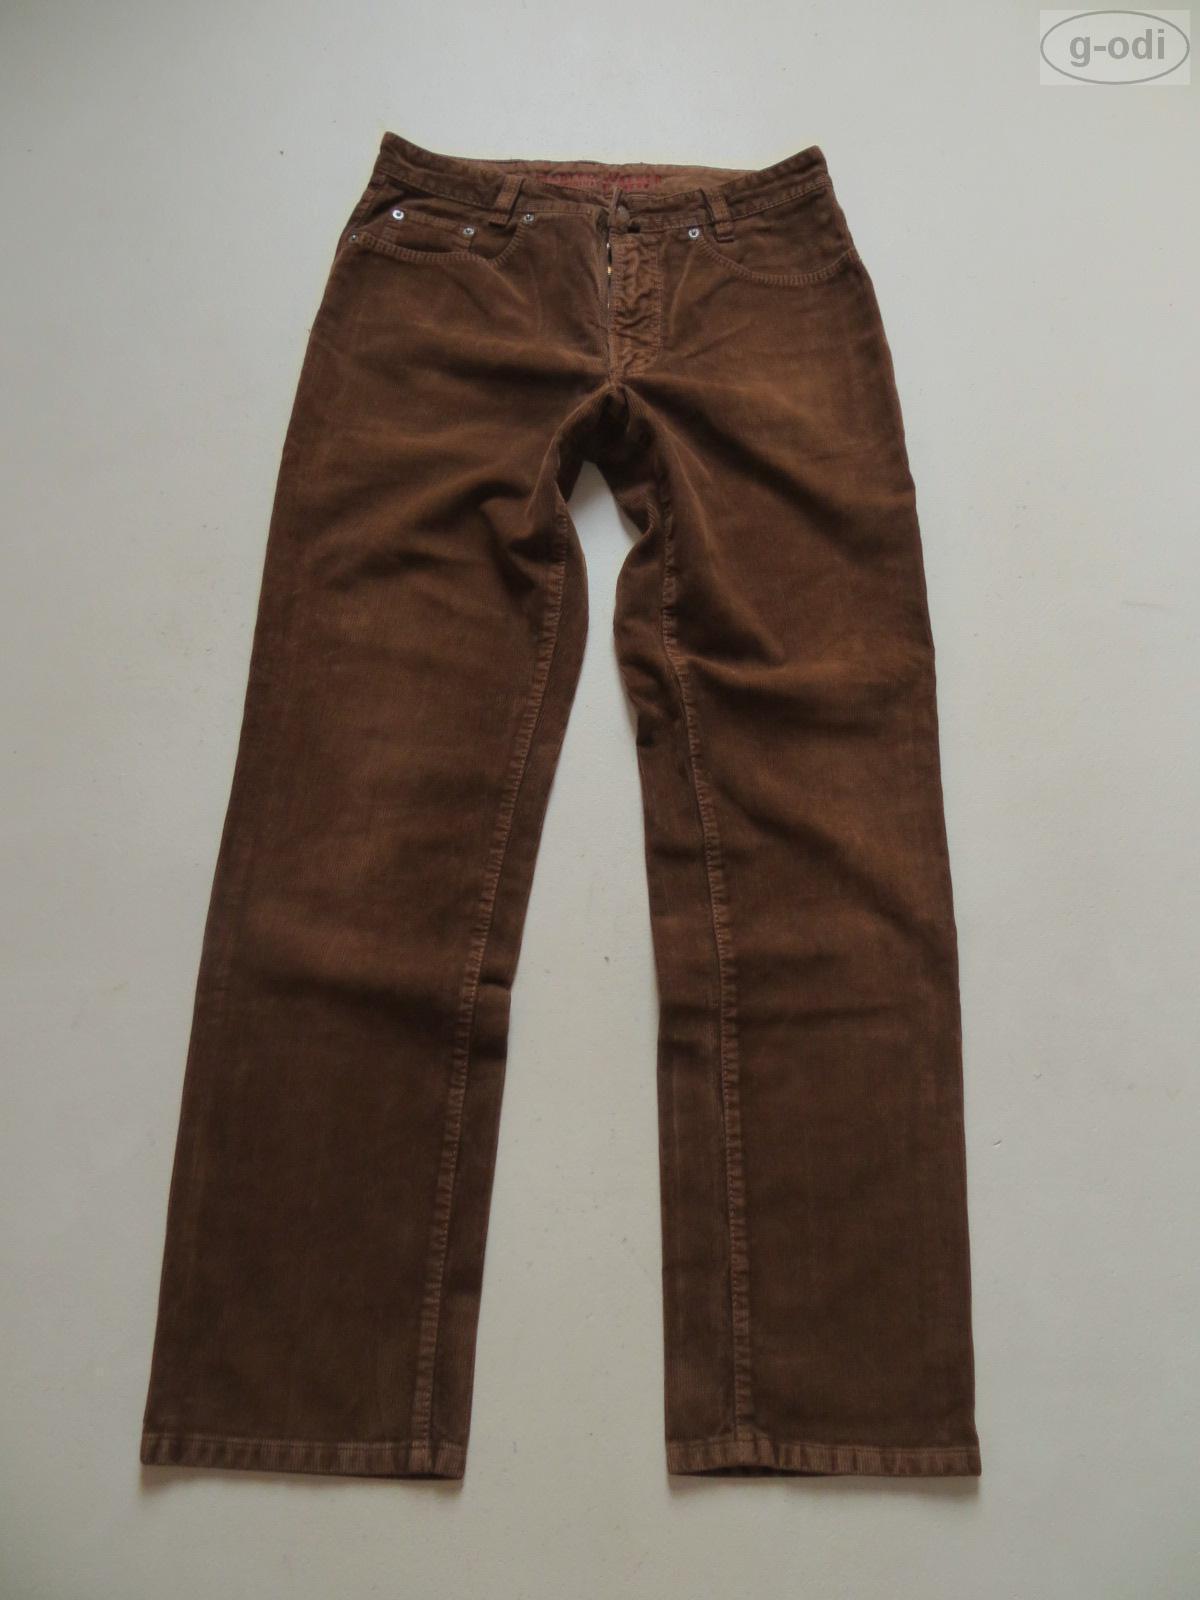 JOKER Jeans Harlem Walker Cordhose W 34  L 34 Braun Hochwertig & Robust RAR